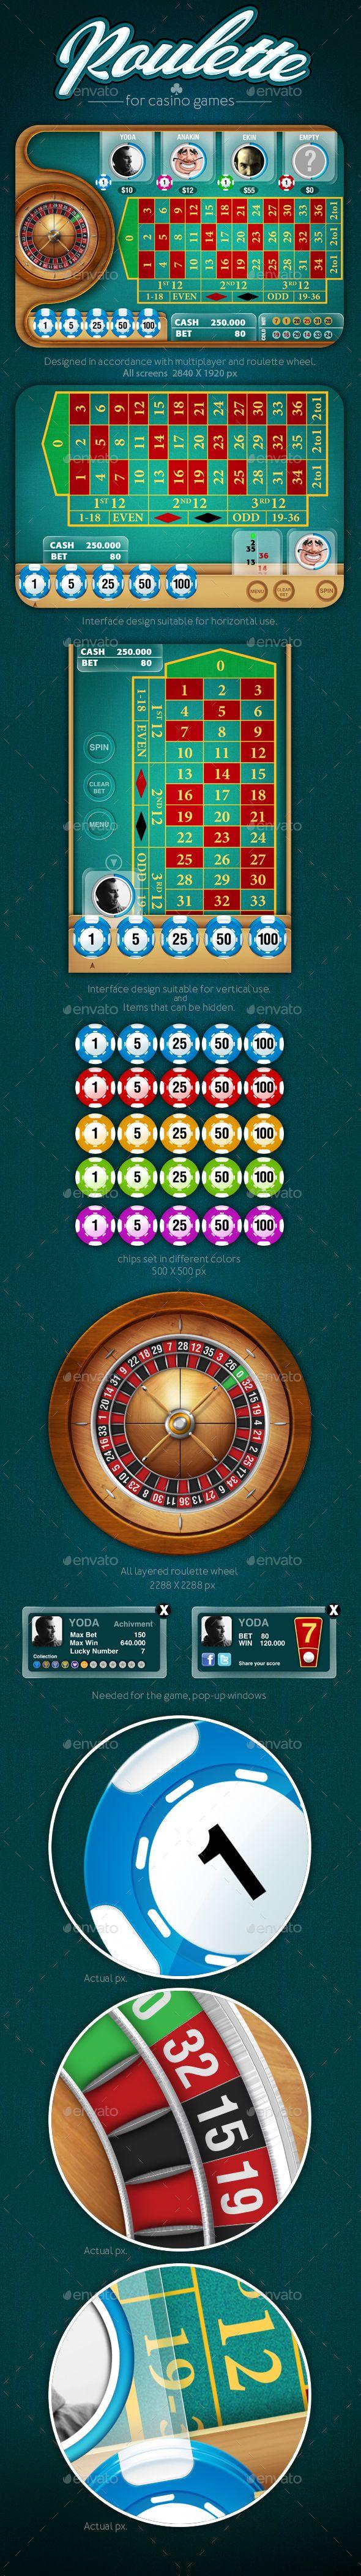 Wooden roulette buy black wooden roulette blackjack table led - Roulette Game For Mobile Platforms